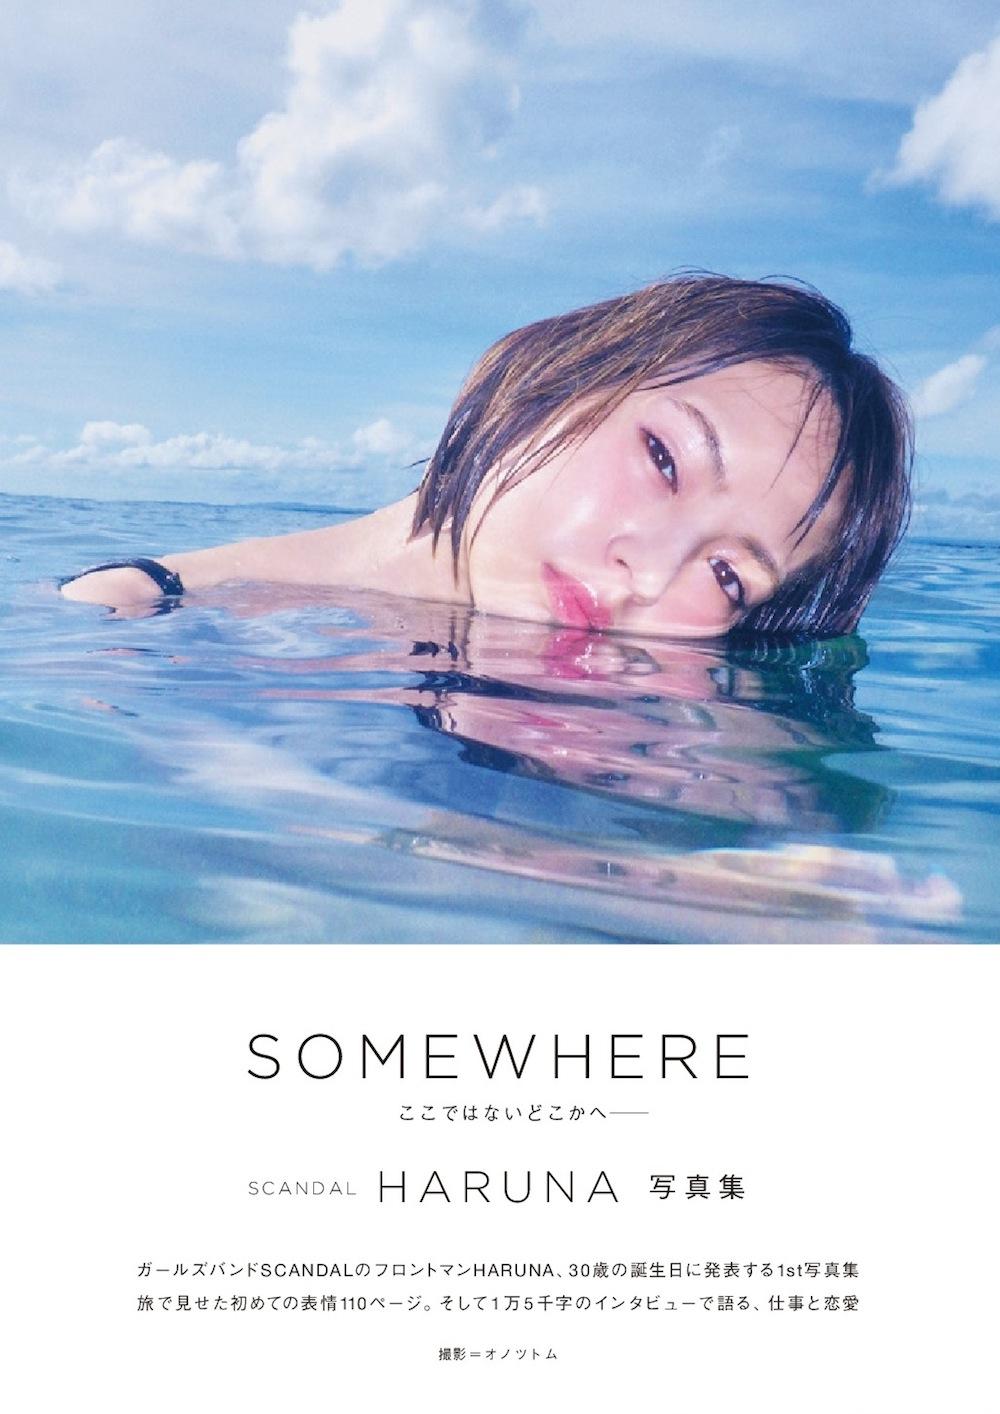 SCANDAL HARUNA 写真集『SOMEWHERE』